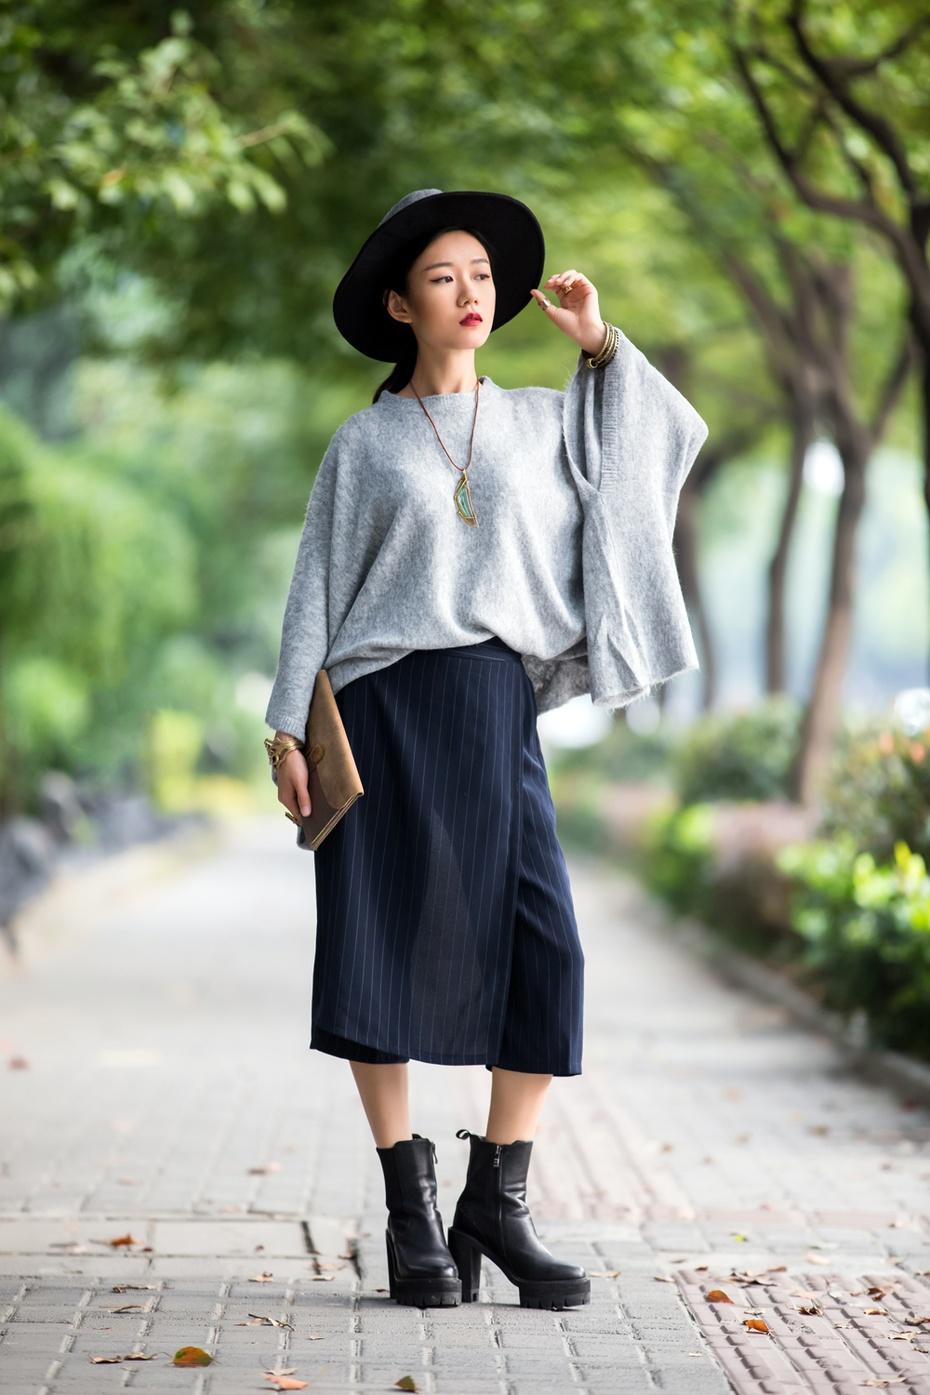 [Ava搭配日记] 和她一起闲谈漫步 - AvaFoo - Avas Fashion Blog